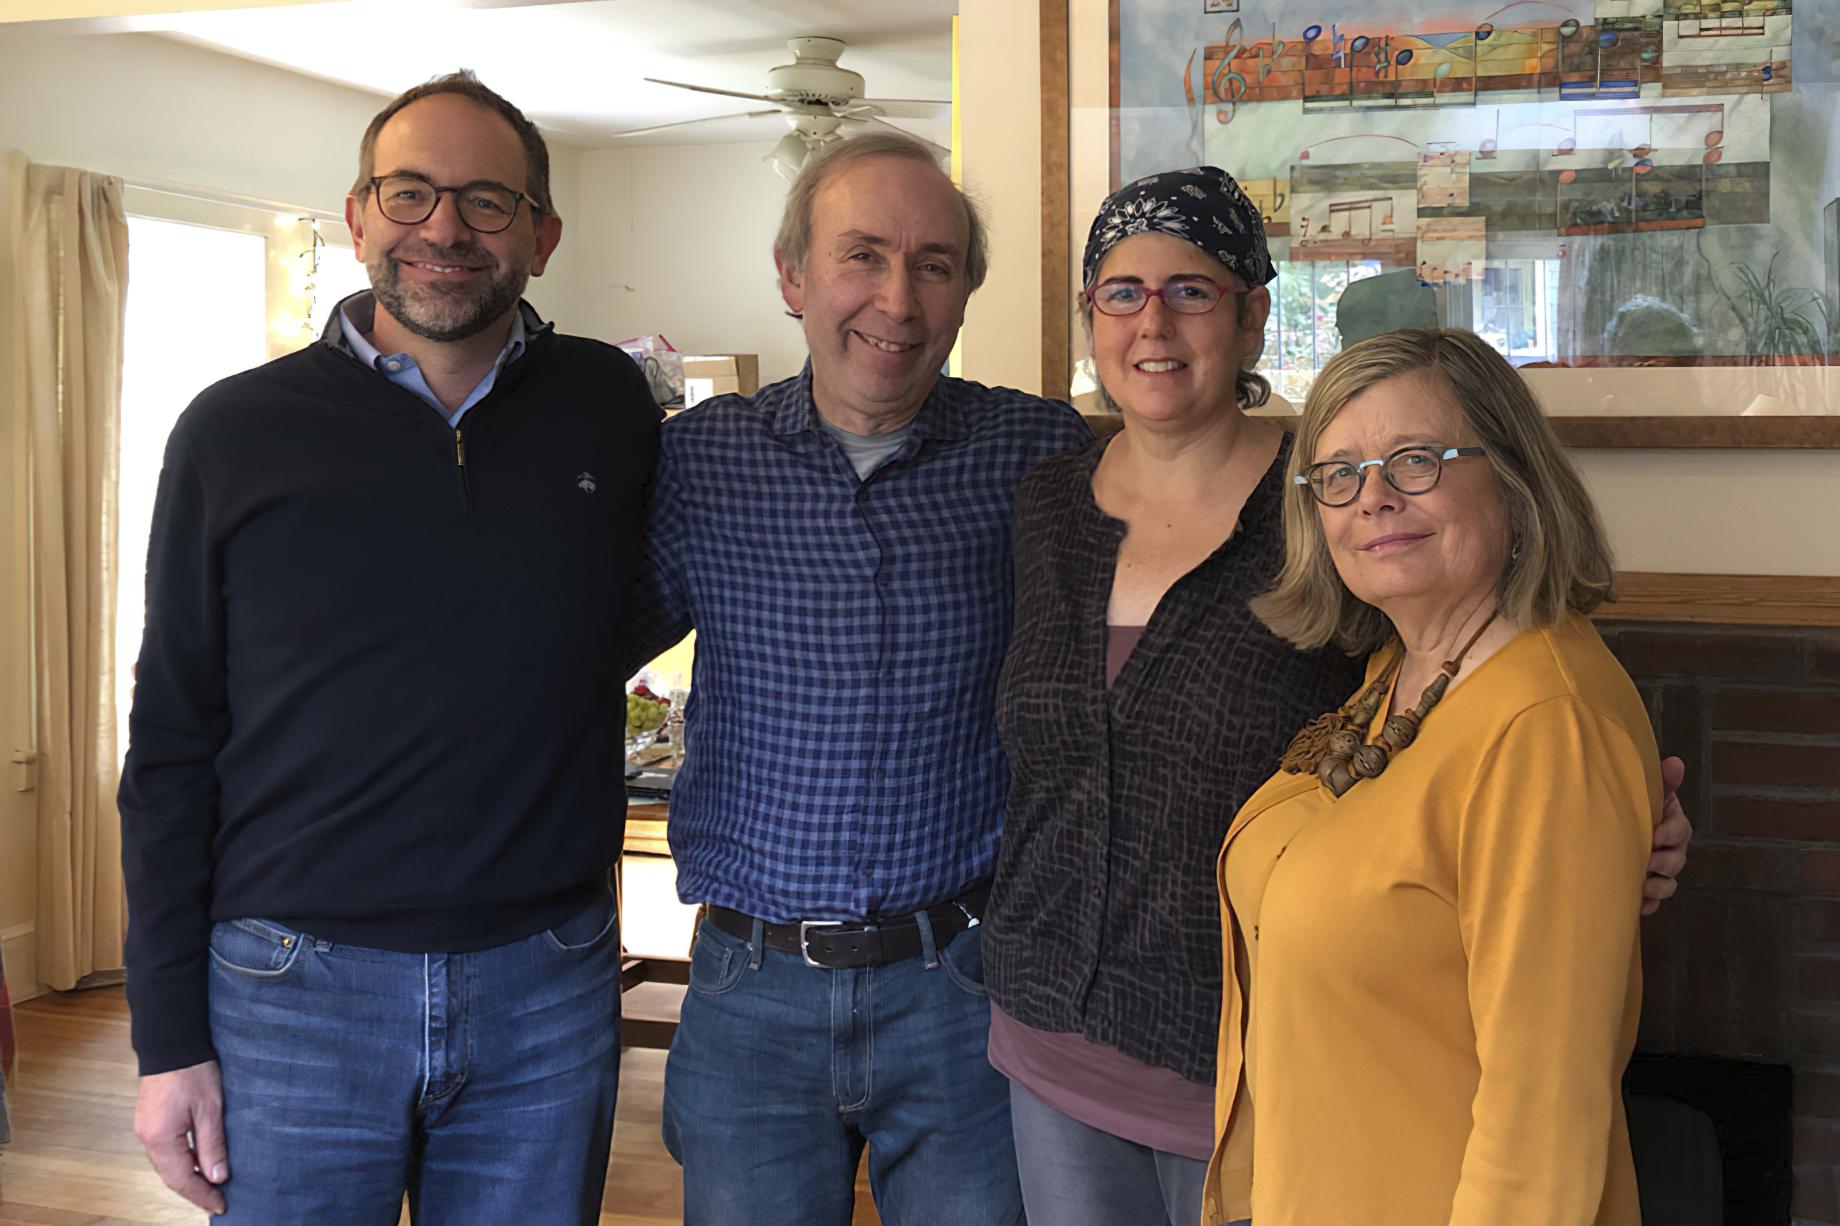 Rachel Zoll, Brian J. Carovillano, Jerry Schwartz, Sarah L. Nordgren